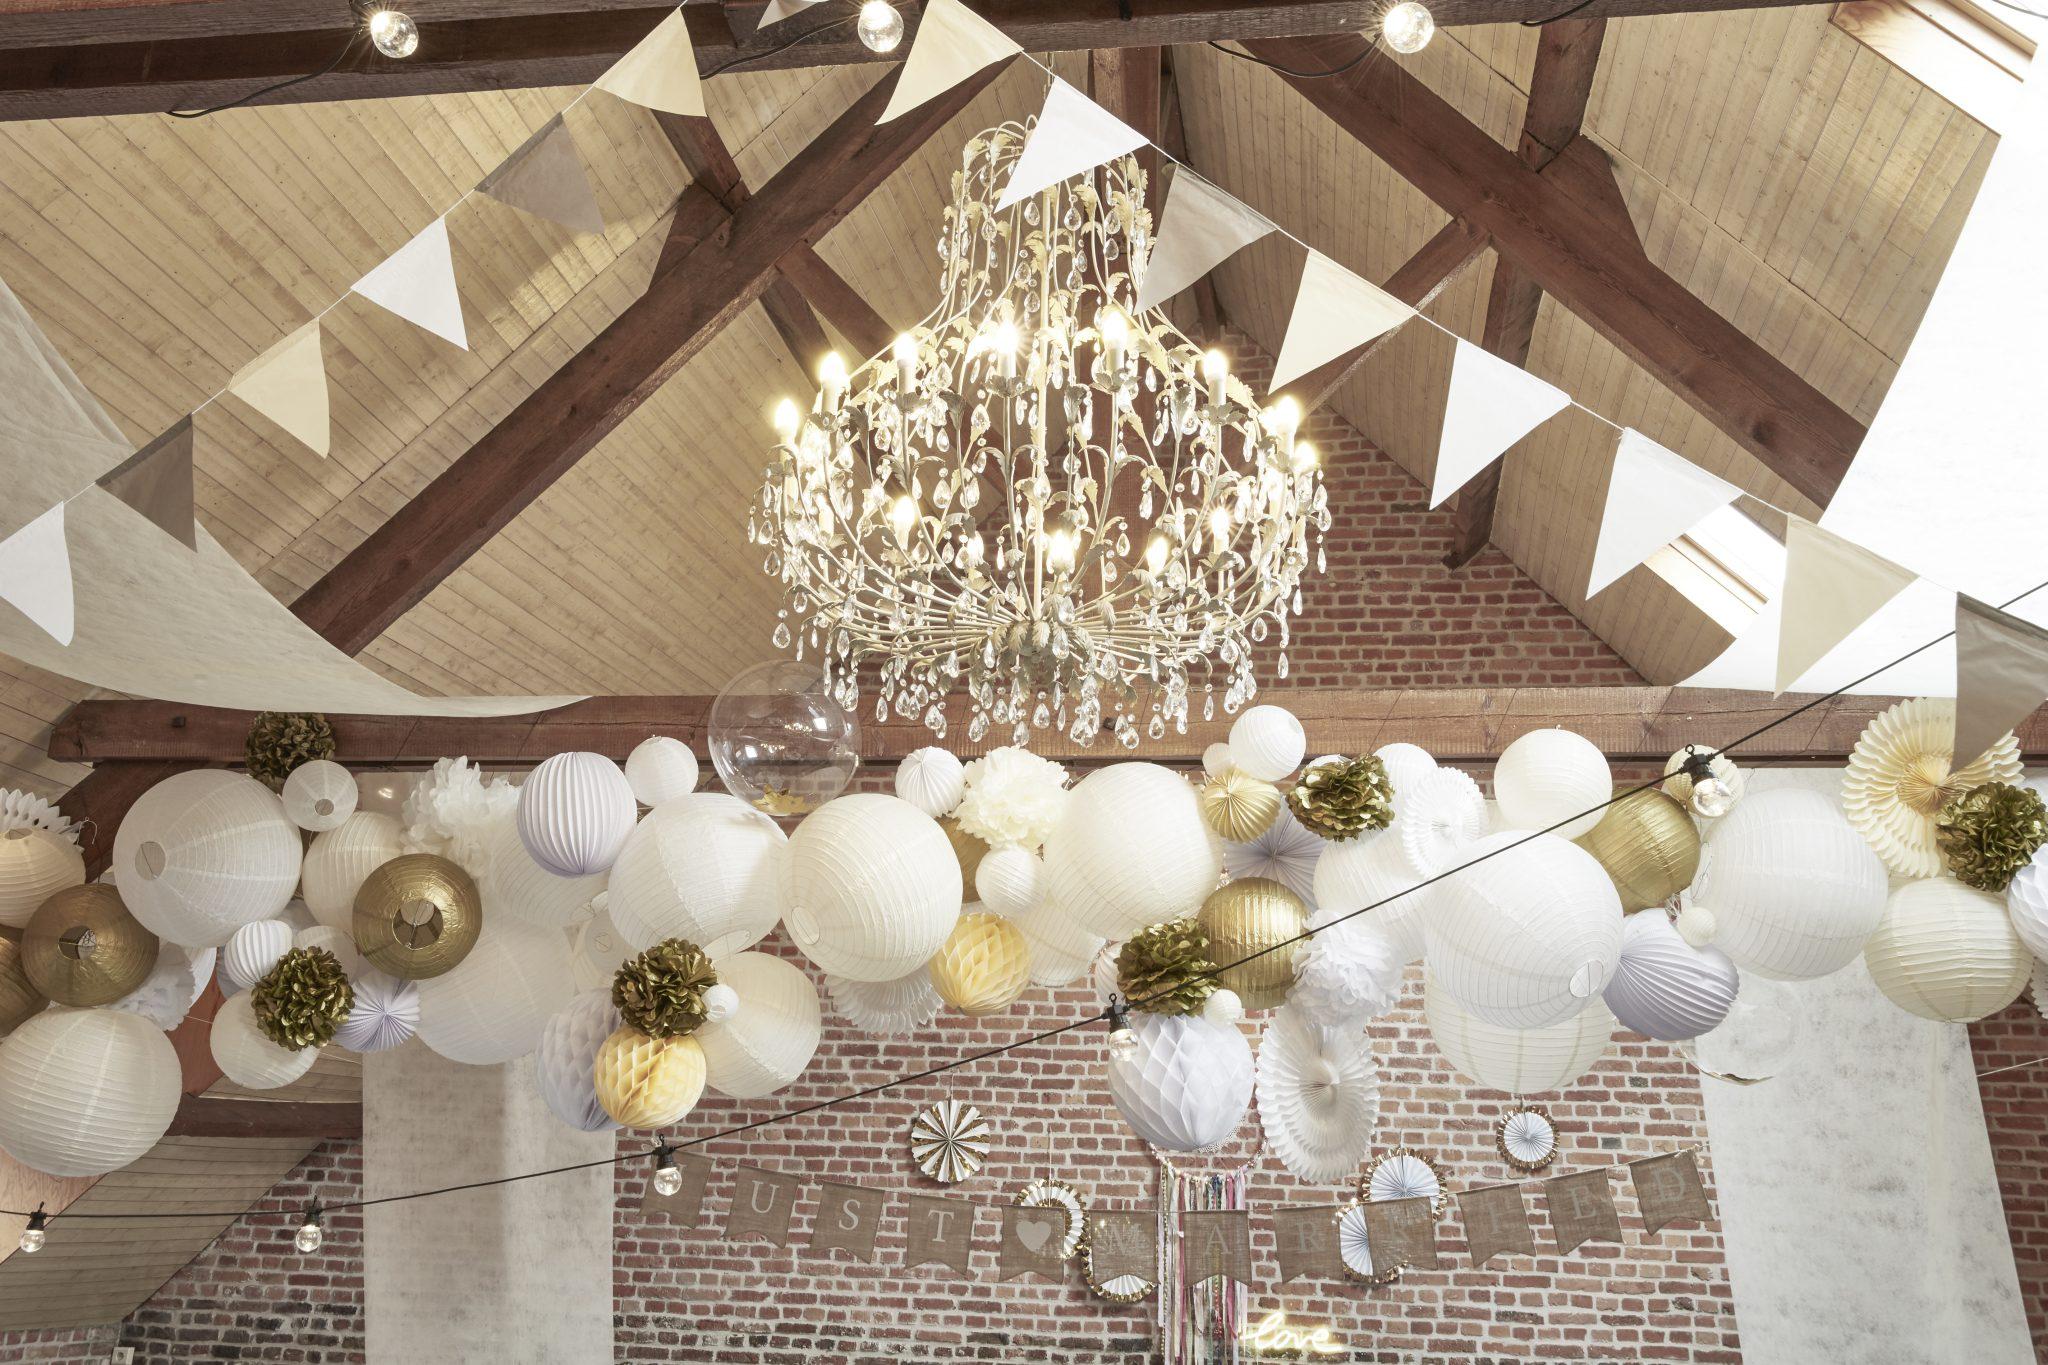 décoration plafond salle champêtre mariage skylantern